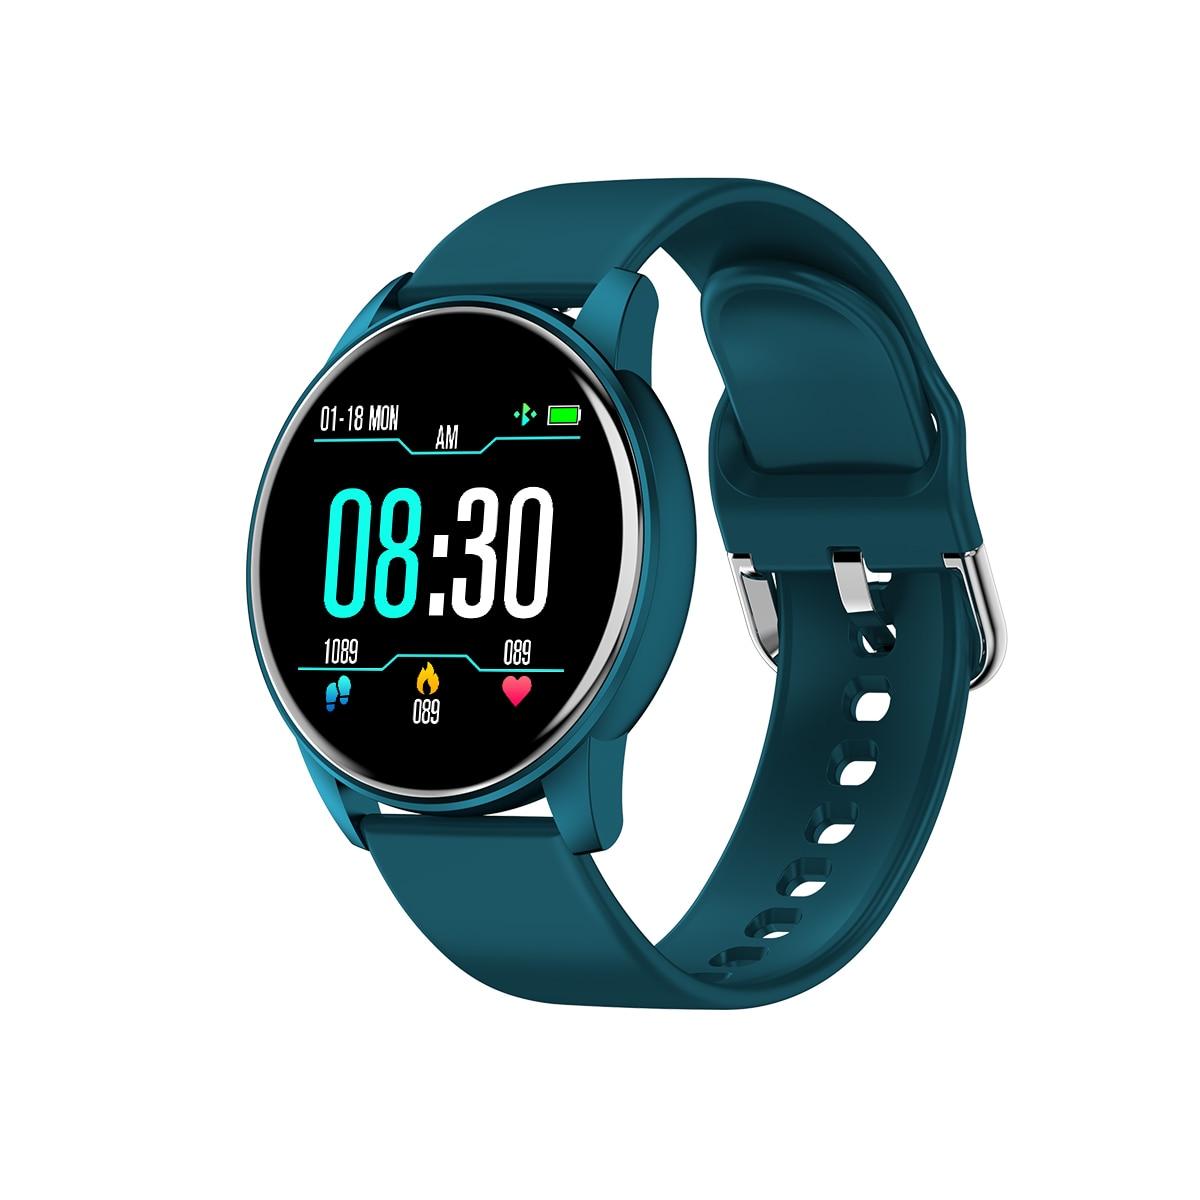 LEMFO Smart Watch Women Sports Tracker Heart Rate Blood Pressure Monitor Waterproof Long Standby Smart Watch Men For Android IOS